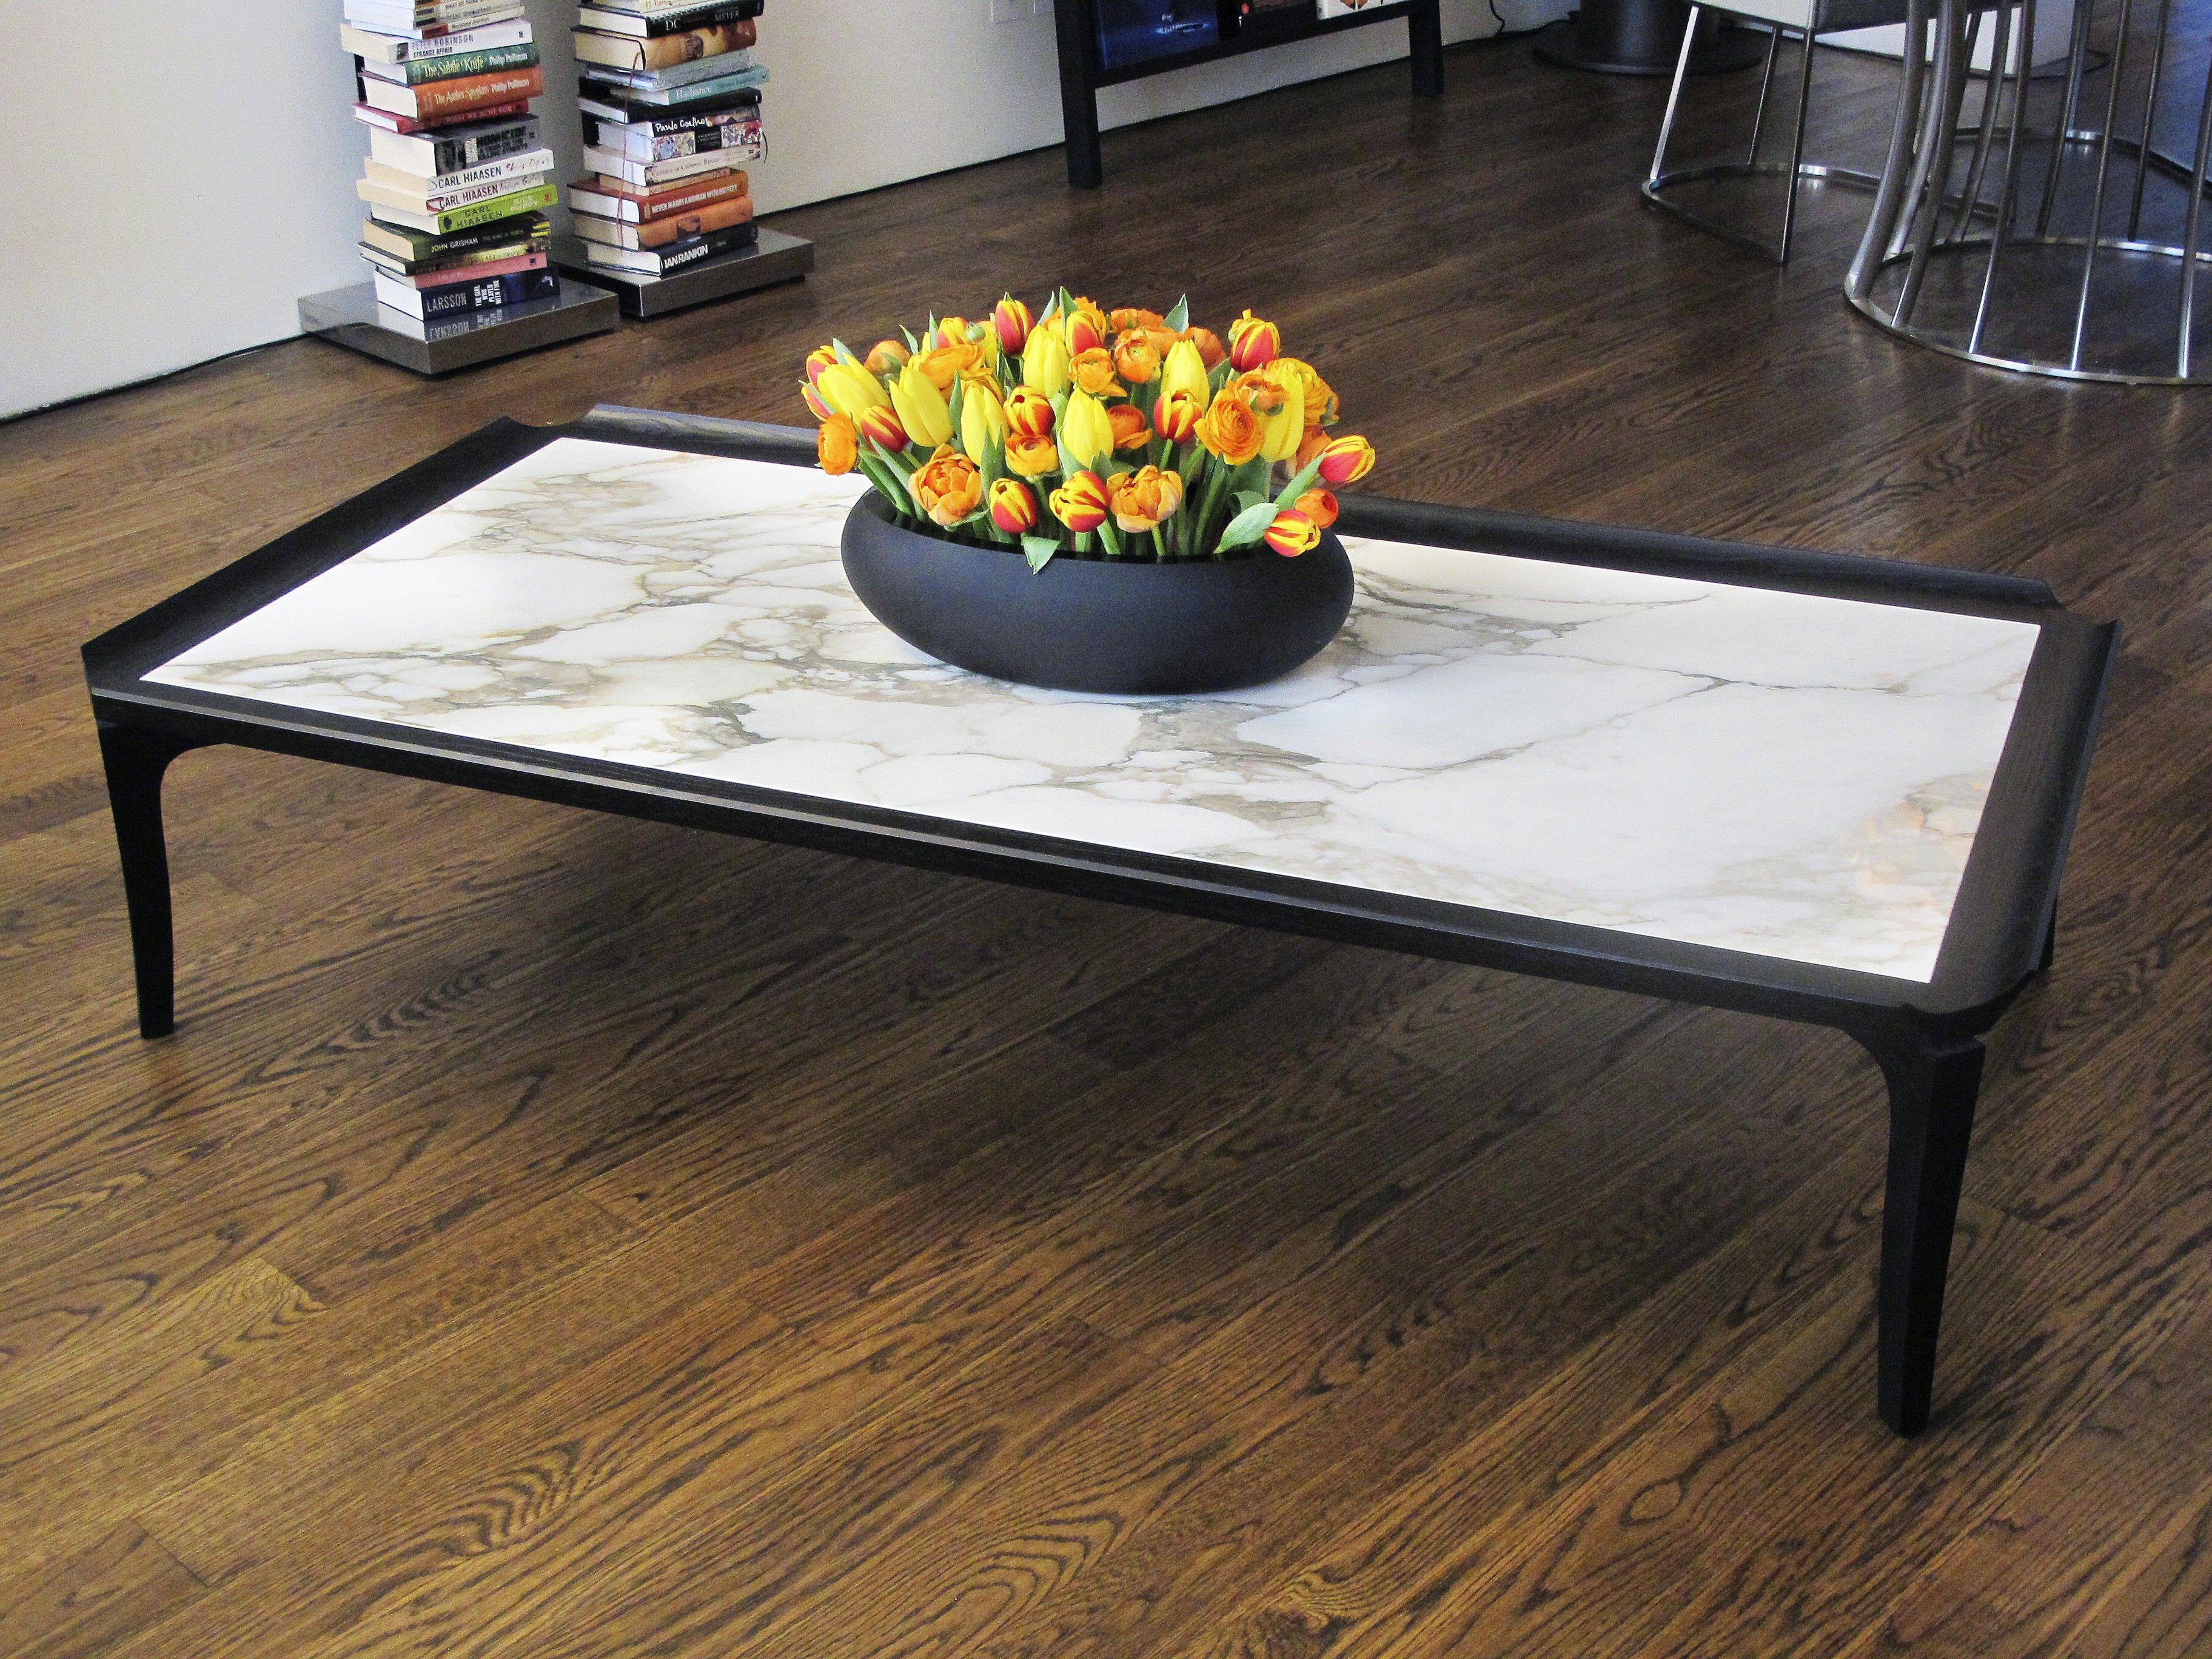 Elegant Italian Furniture mood shogun coffee table: an elegant rectangular low #coffeetable